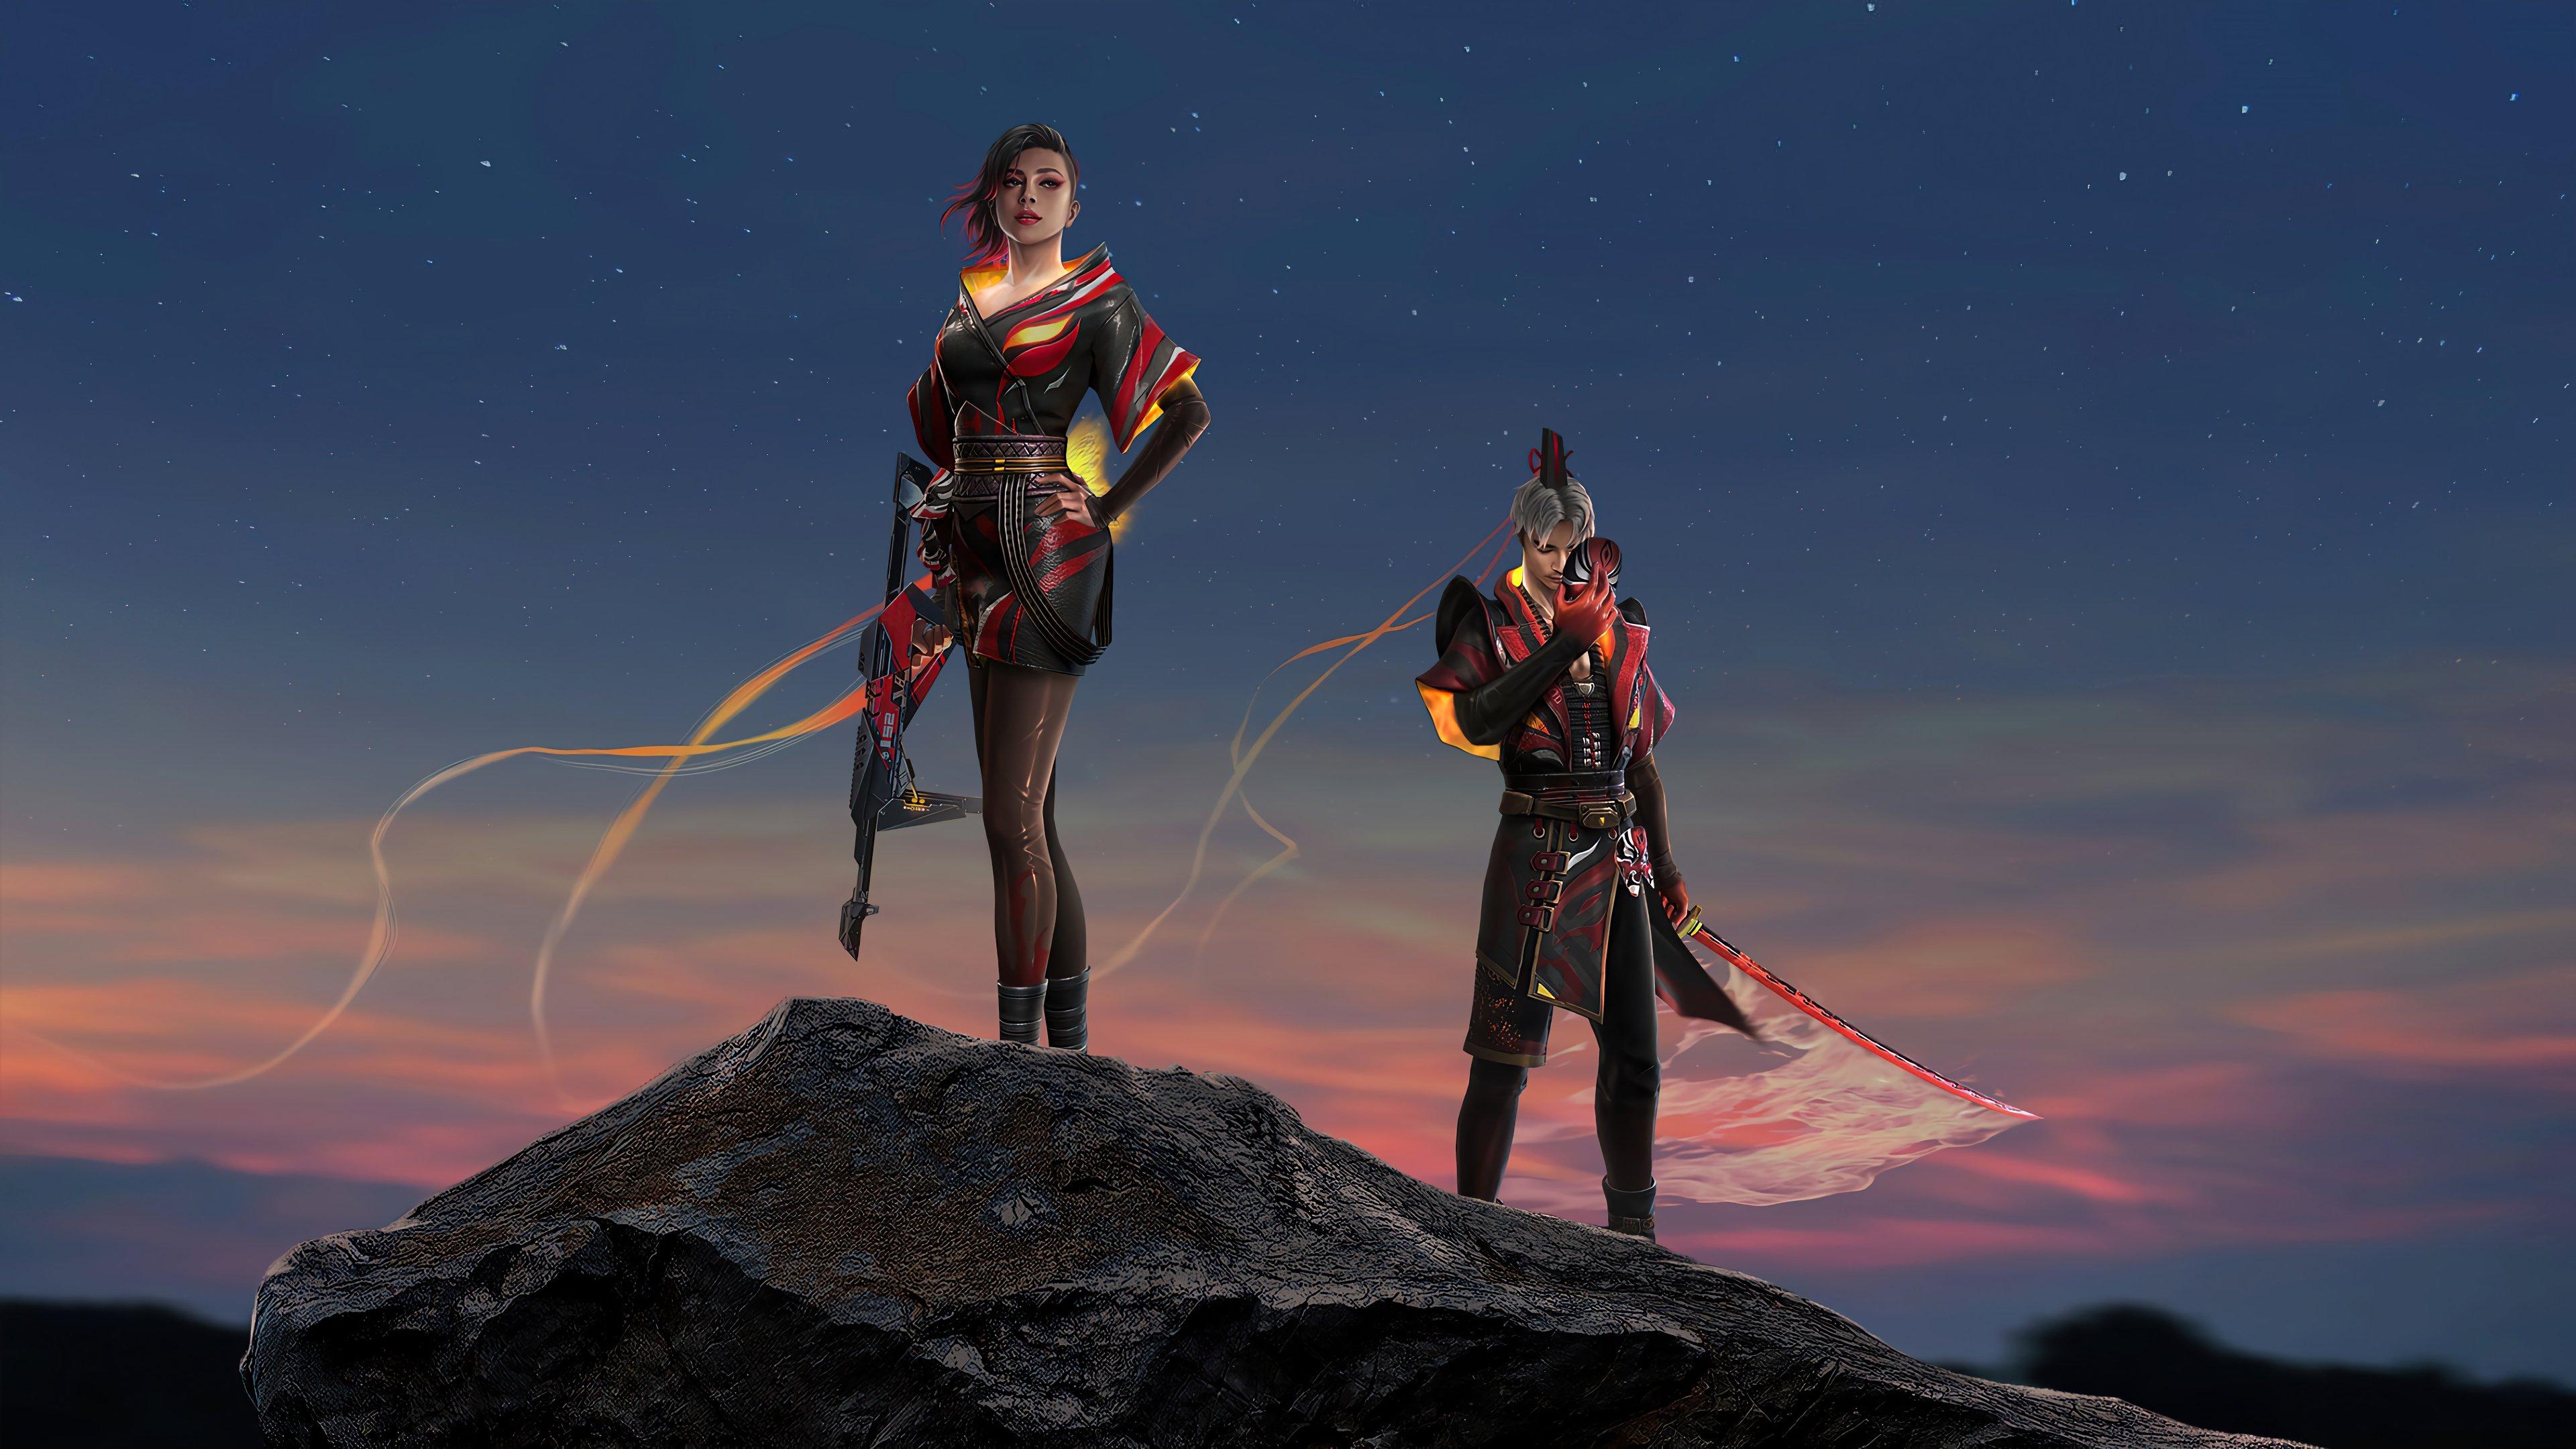 Fondos de pantalla Skins de personajes de Garena Free Fire